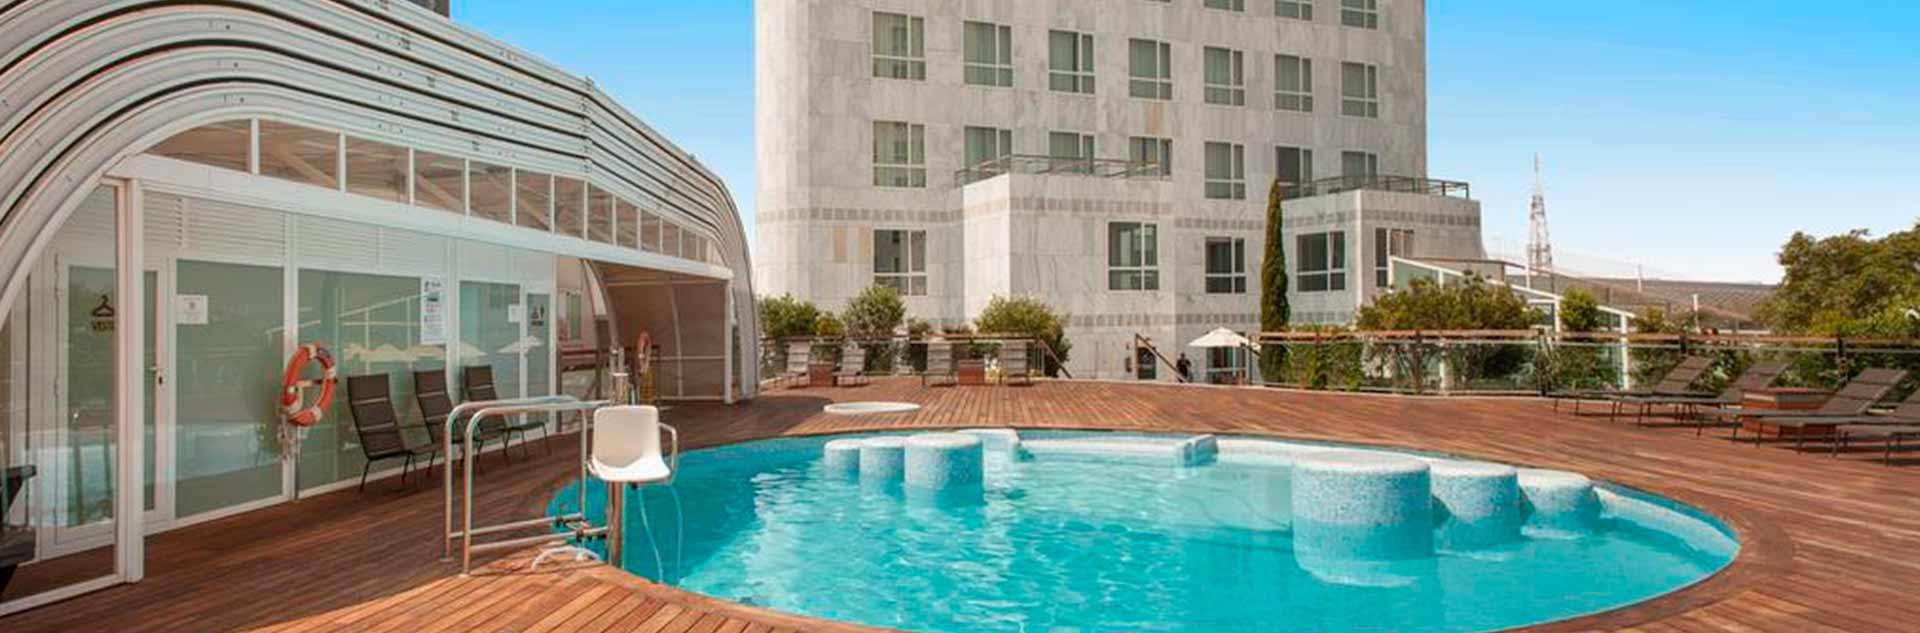 Piscina del hotel Sorolla Palace 4* de Valencia